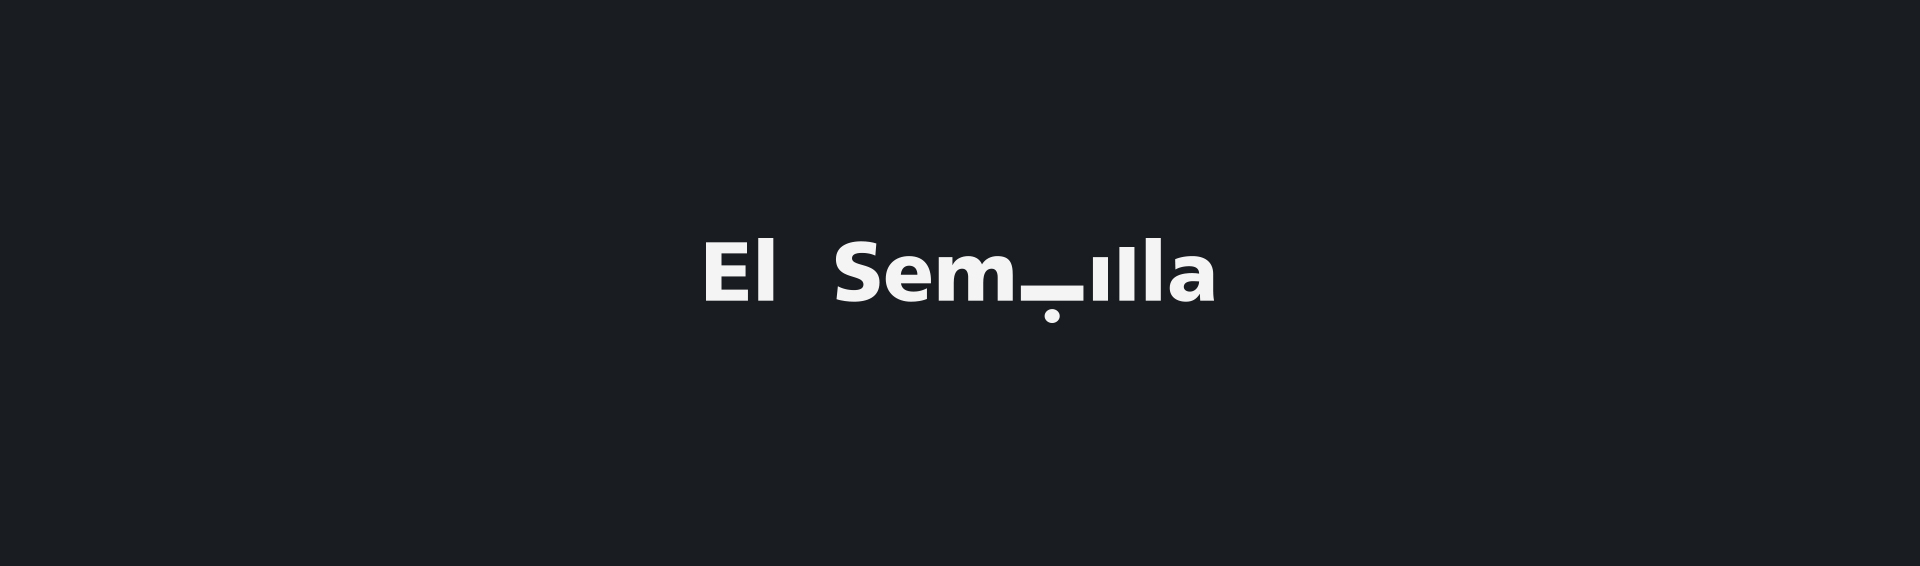 elsemilla_logotype_identity_corporate